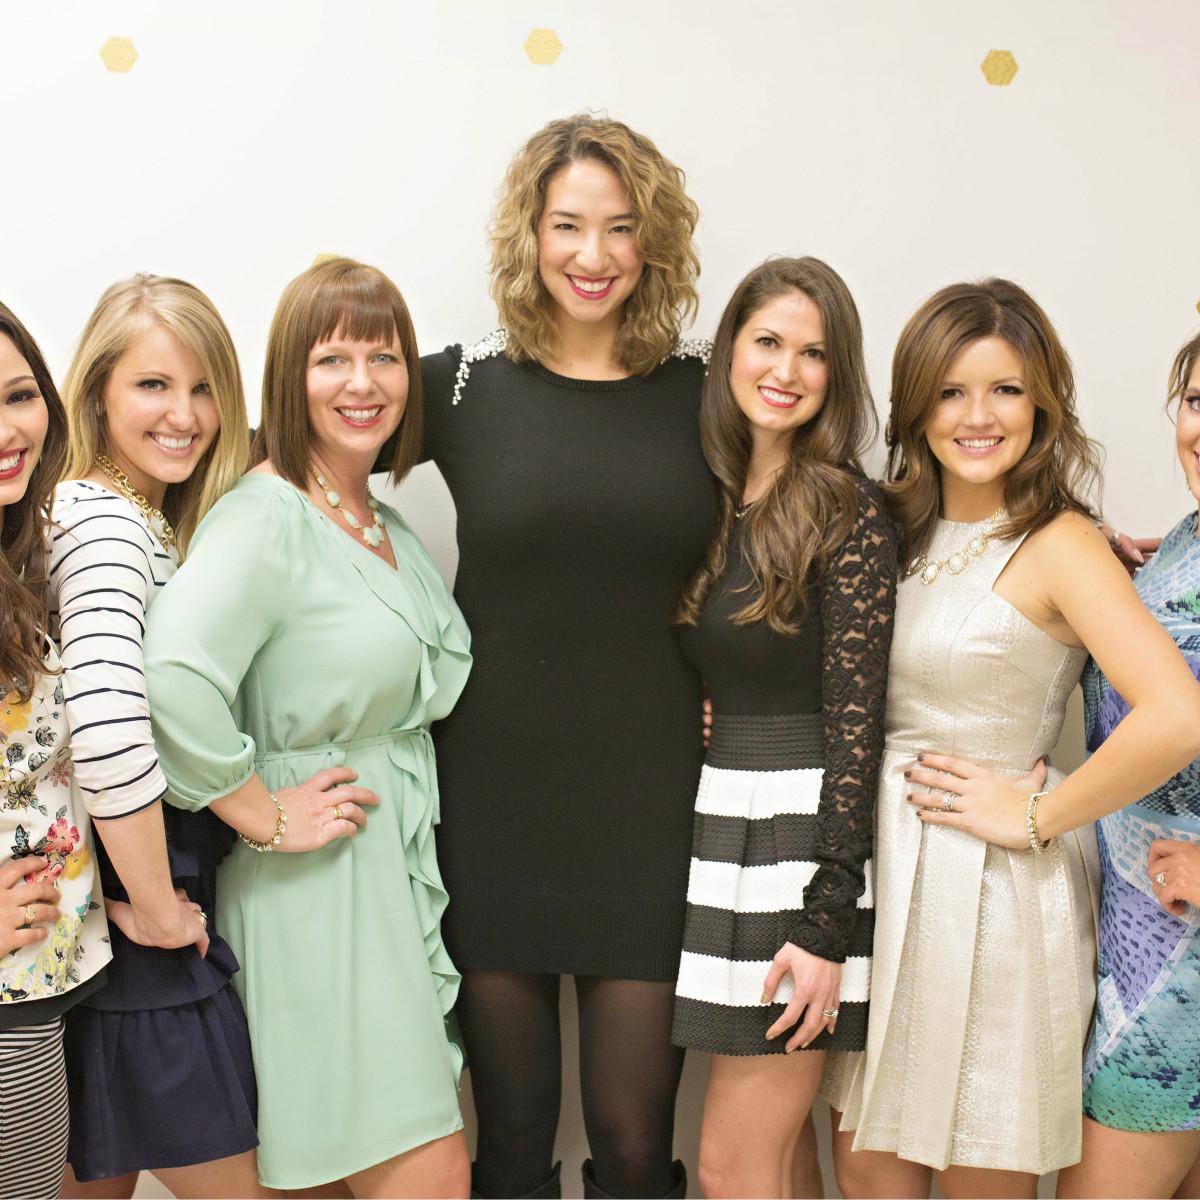 Raquel Lovern, Kelly McGraw, Alyssa Turner, Veronica Perez, Kara Stout, Elisabeth Landry, Jenna Thomas